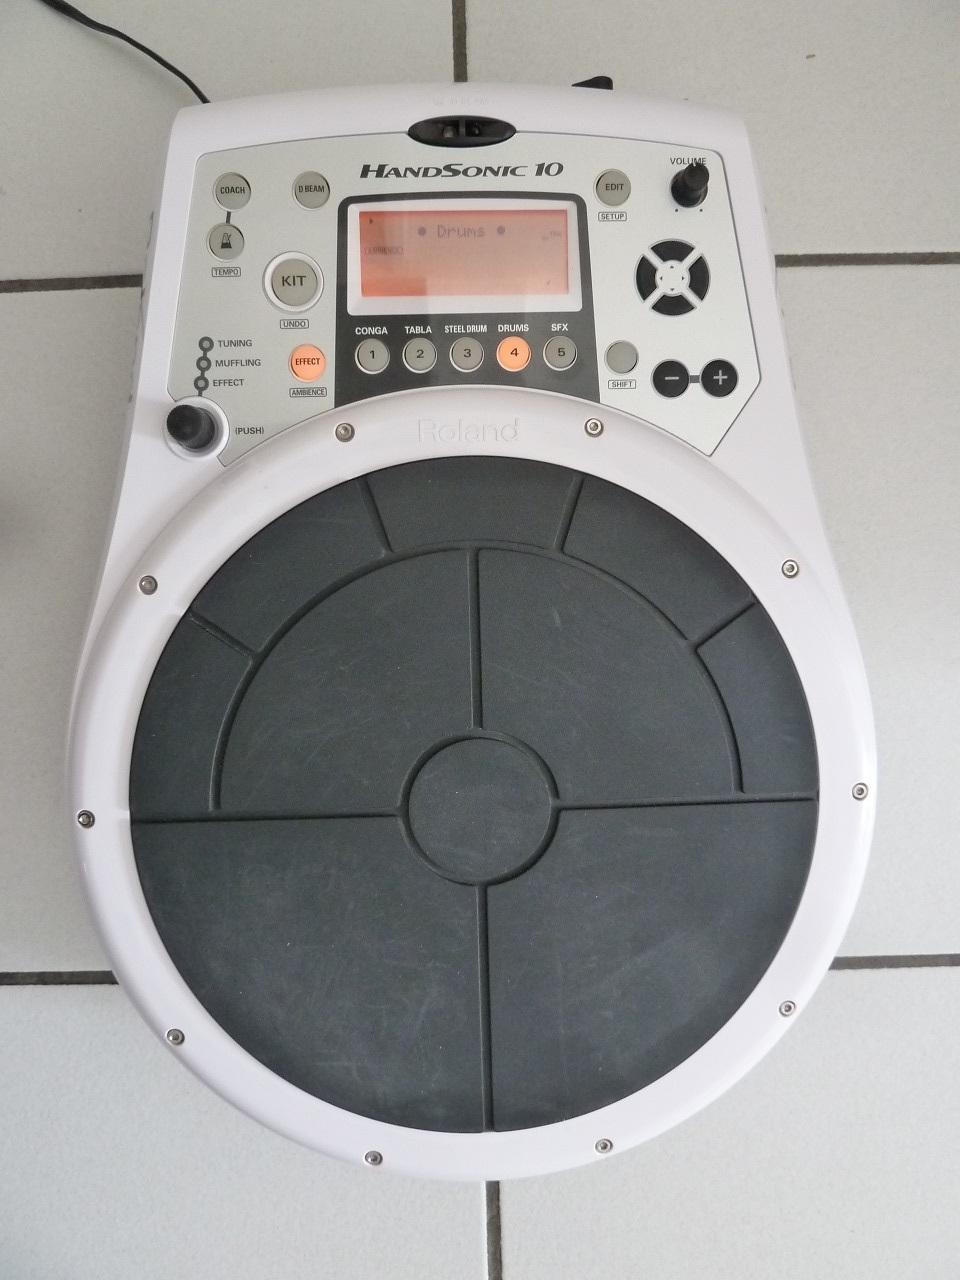 HPD-10 HANDSONIC - Roland HPD-10 Handsonic - Audiofanzine 06296cf719d1